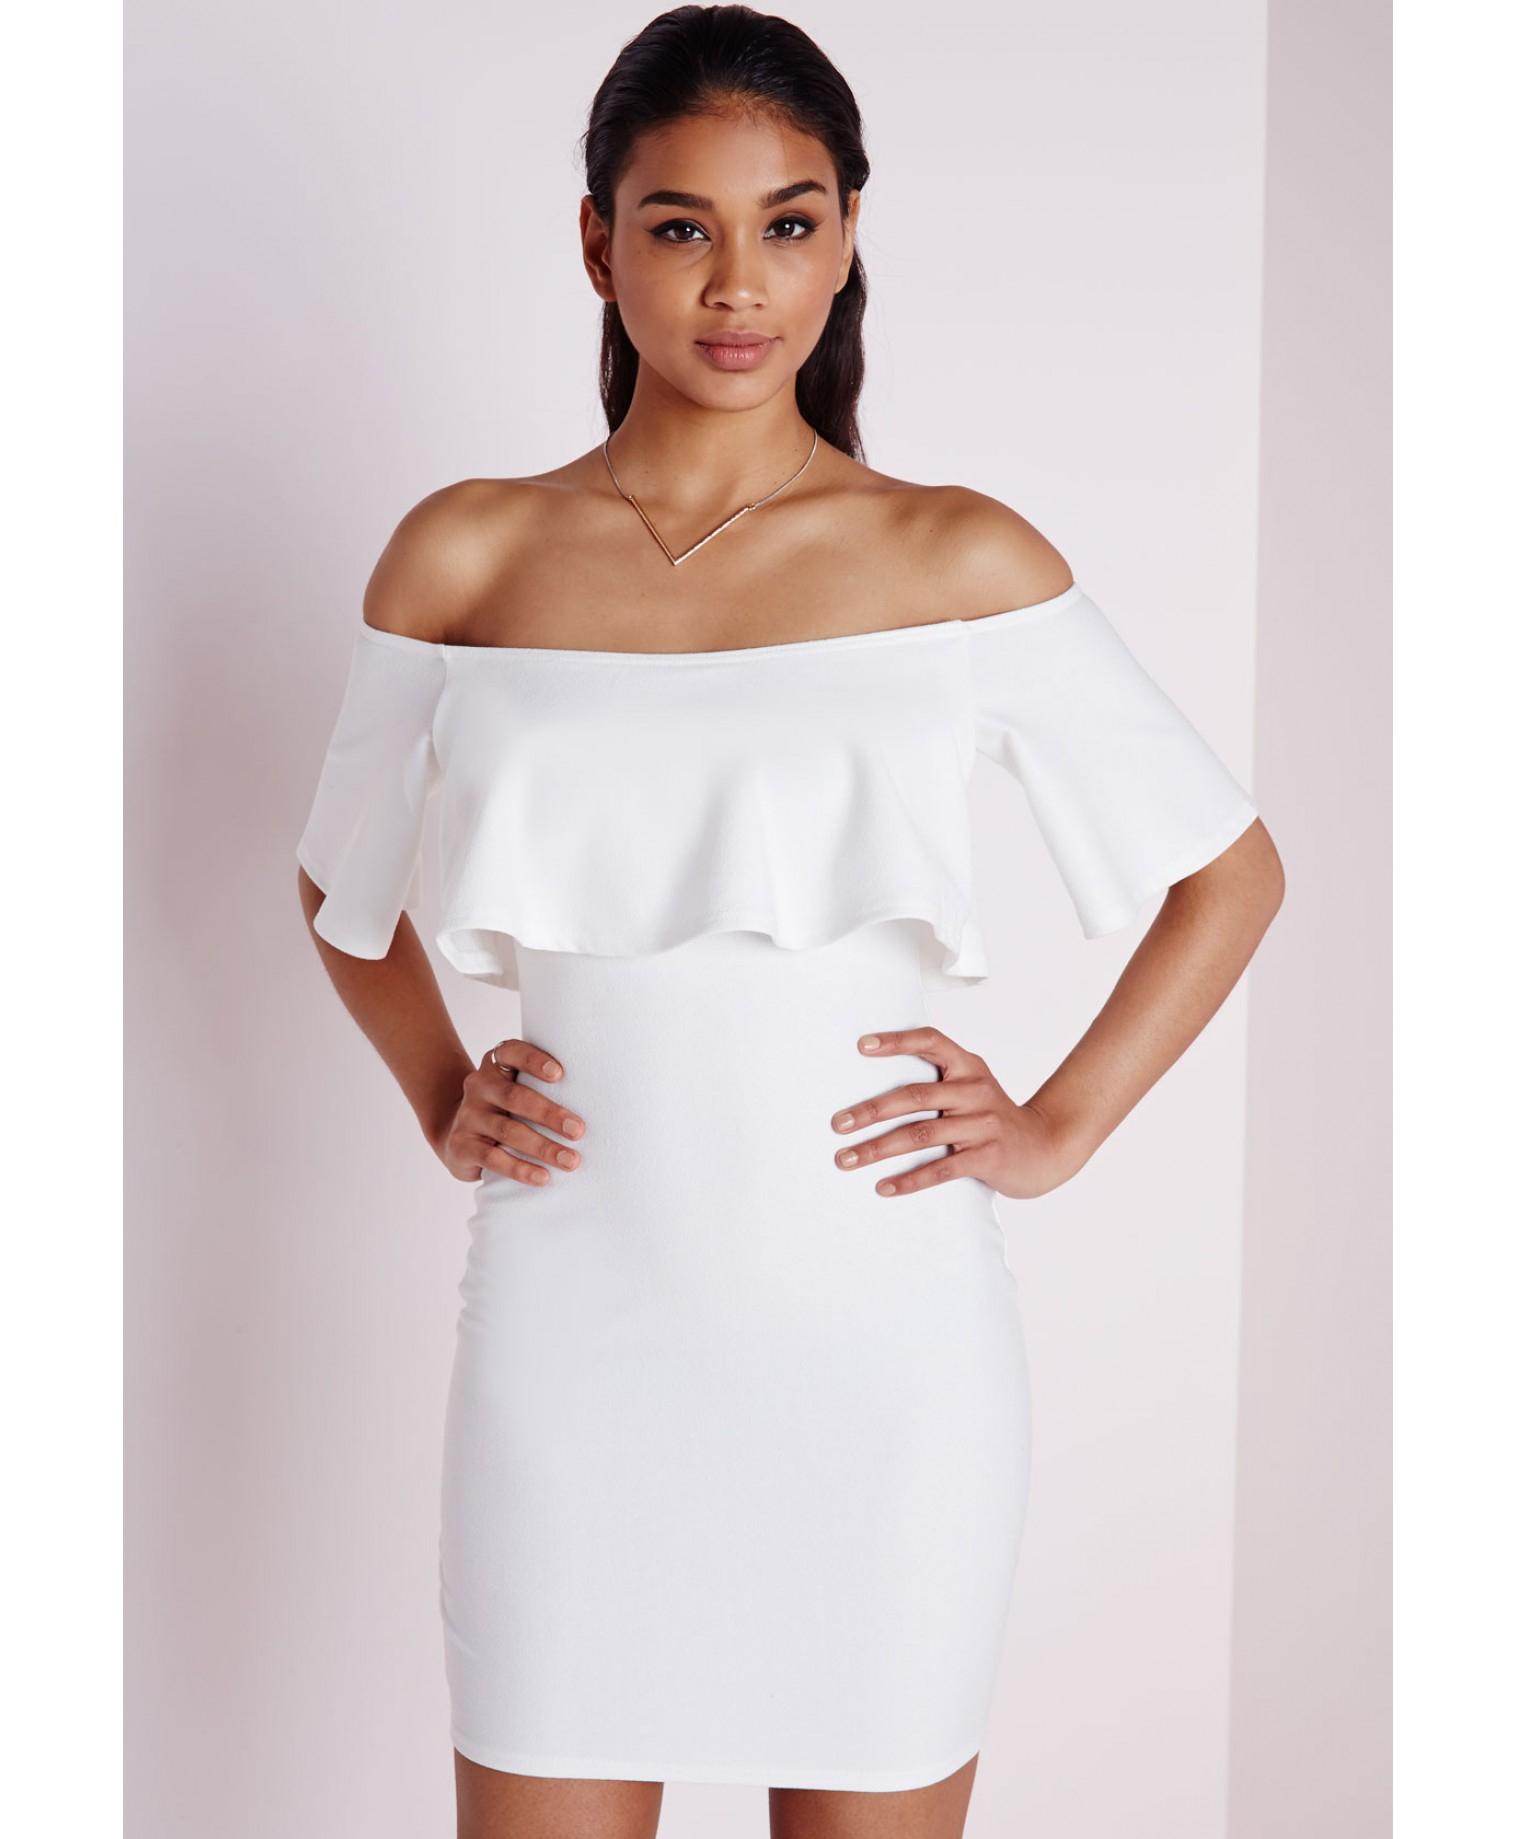 6691f9e0f Lyst - Missguided Crepe Frill Bodycon Dress White in White